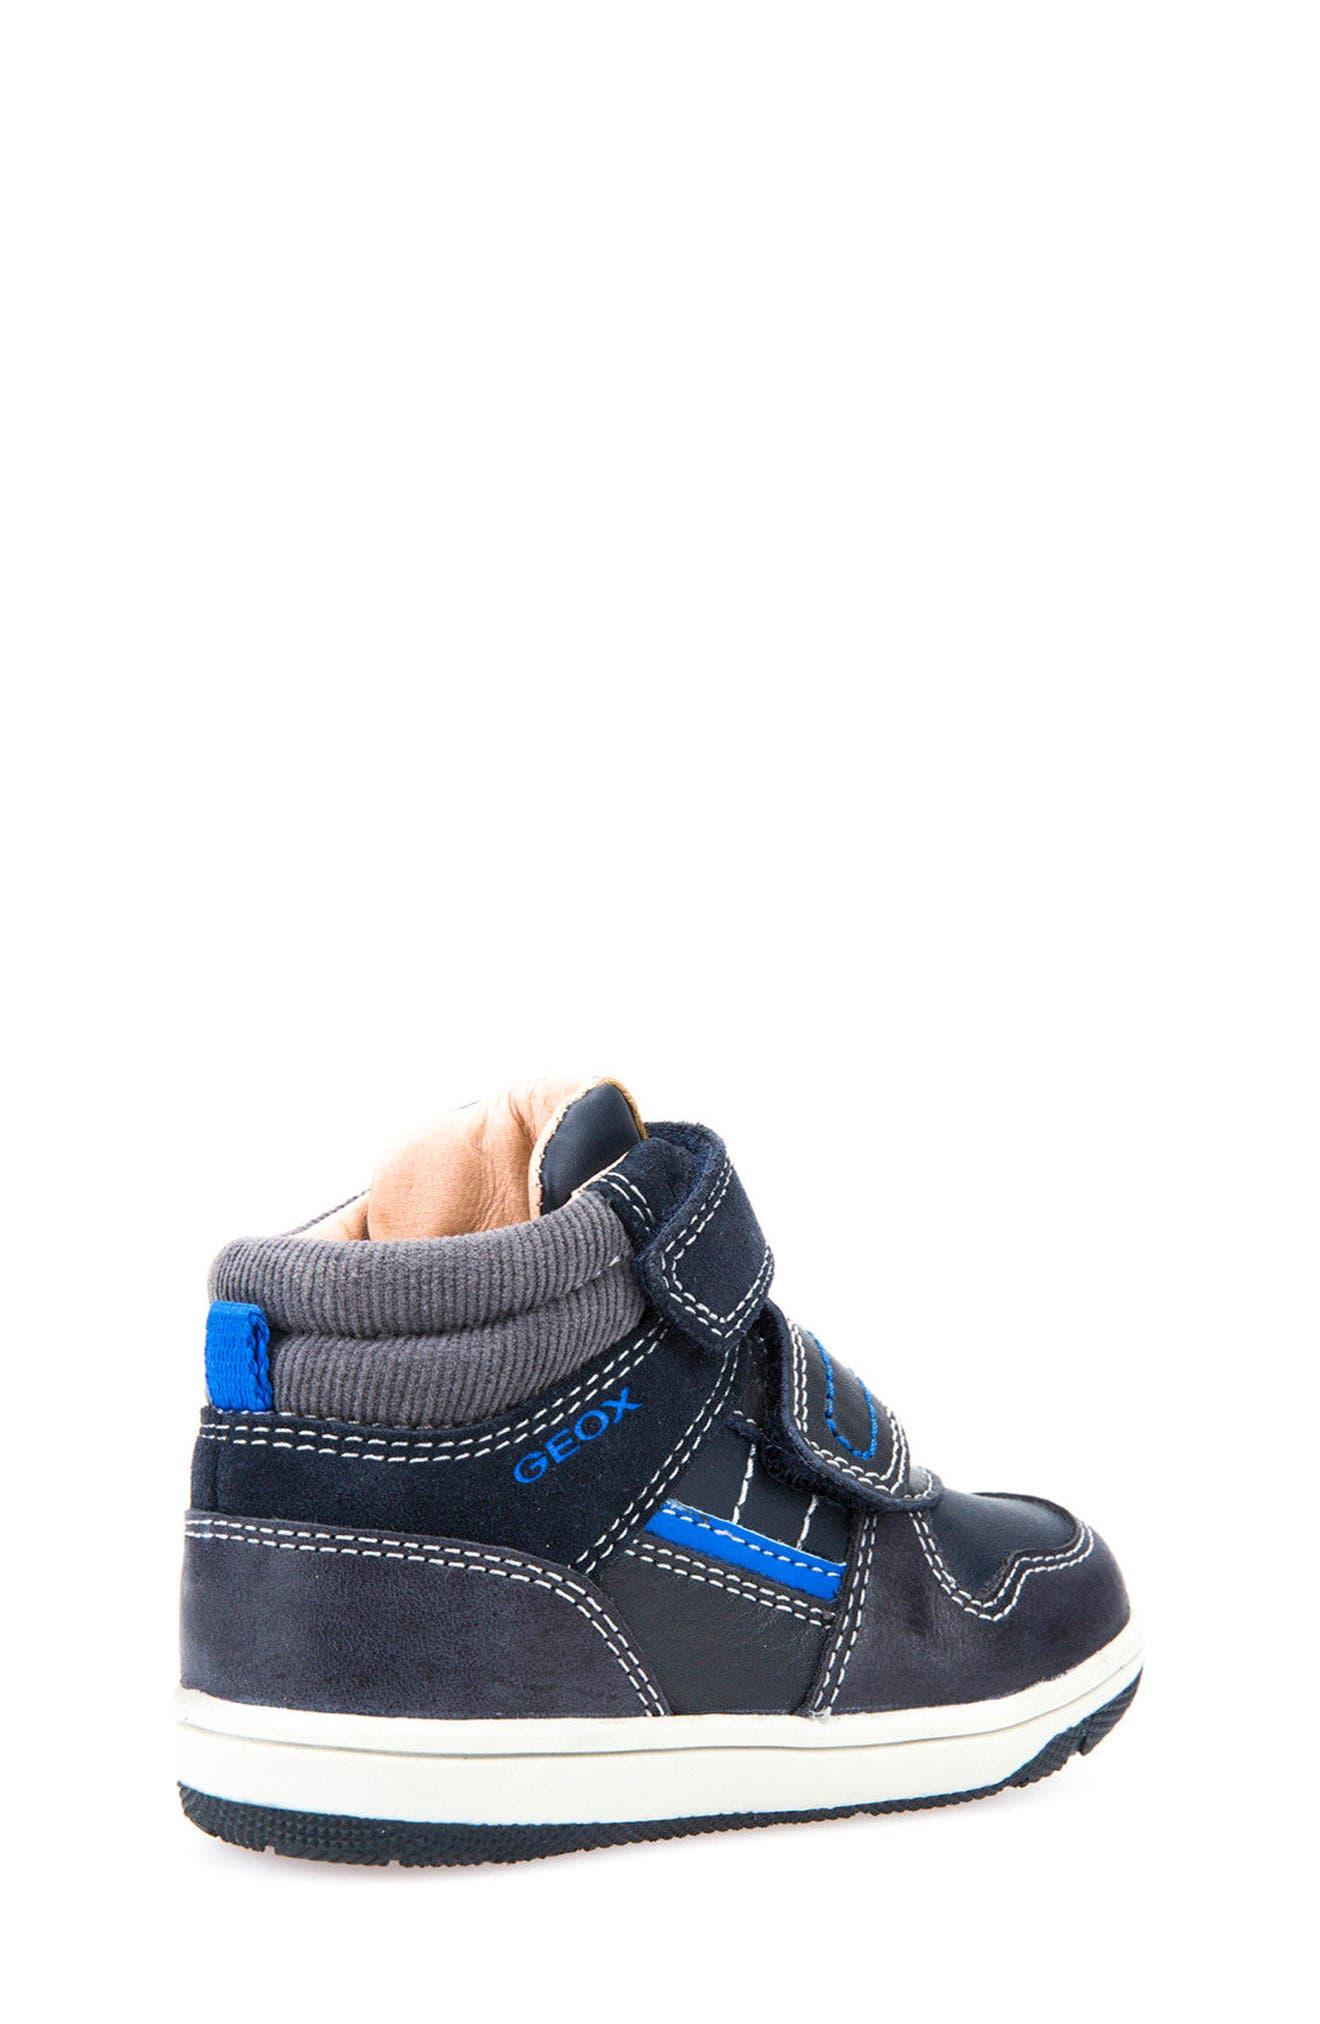 New Flick Mid Top Sneaker,                             Alternate thumbnail 2, color,                             002